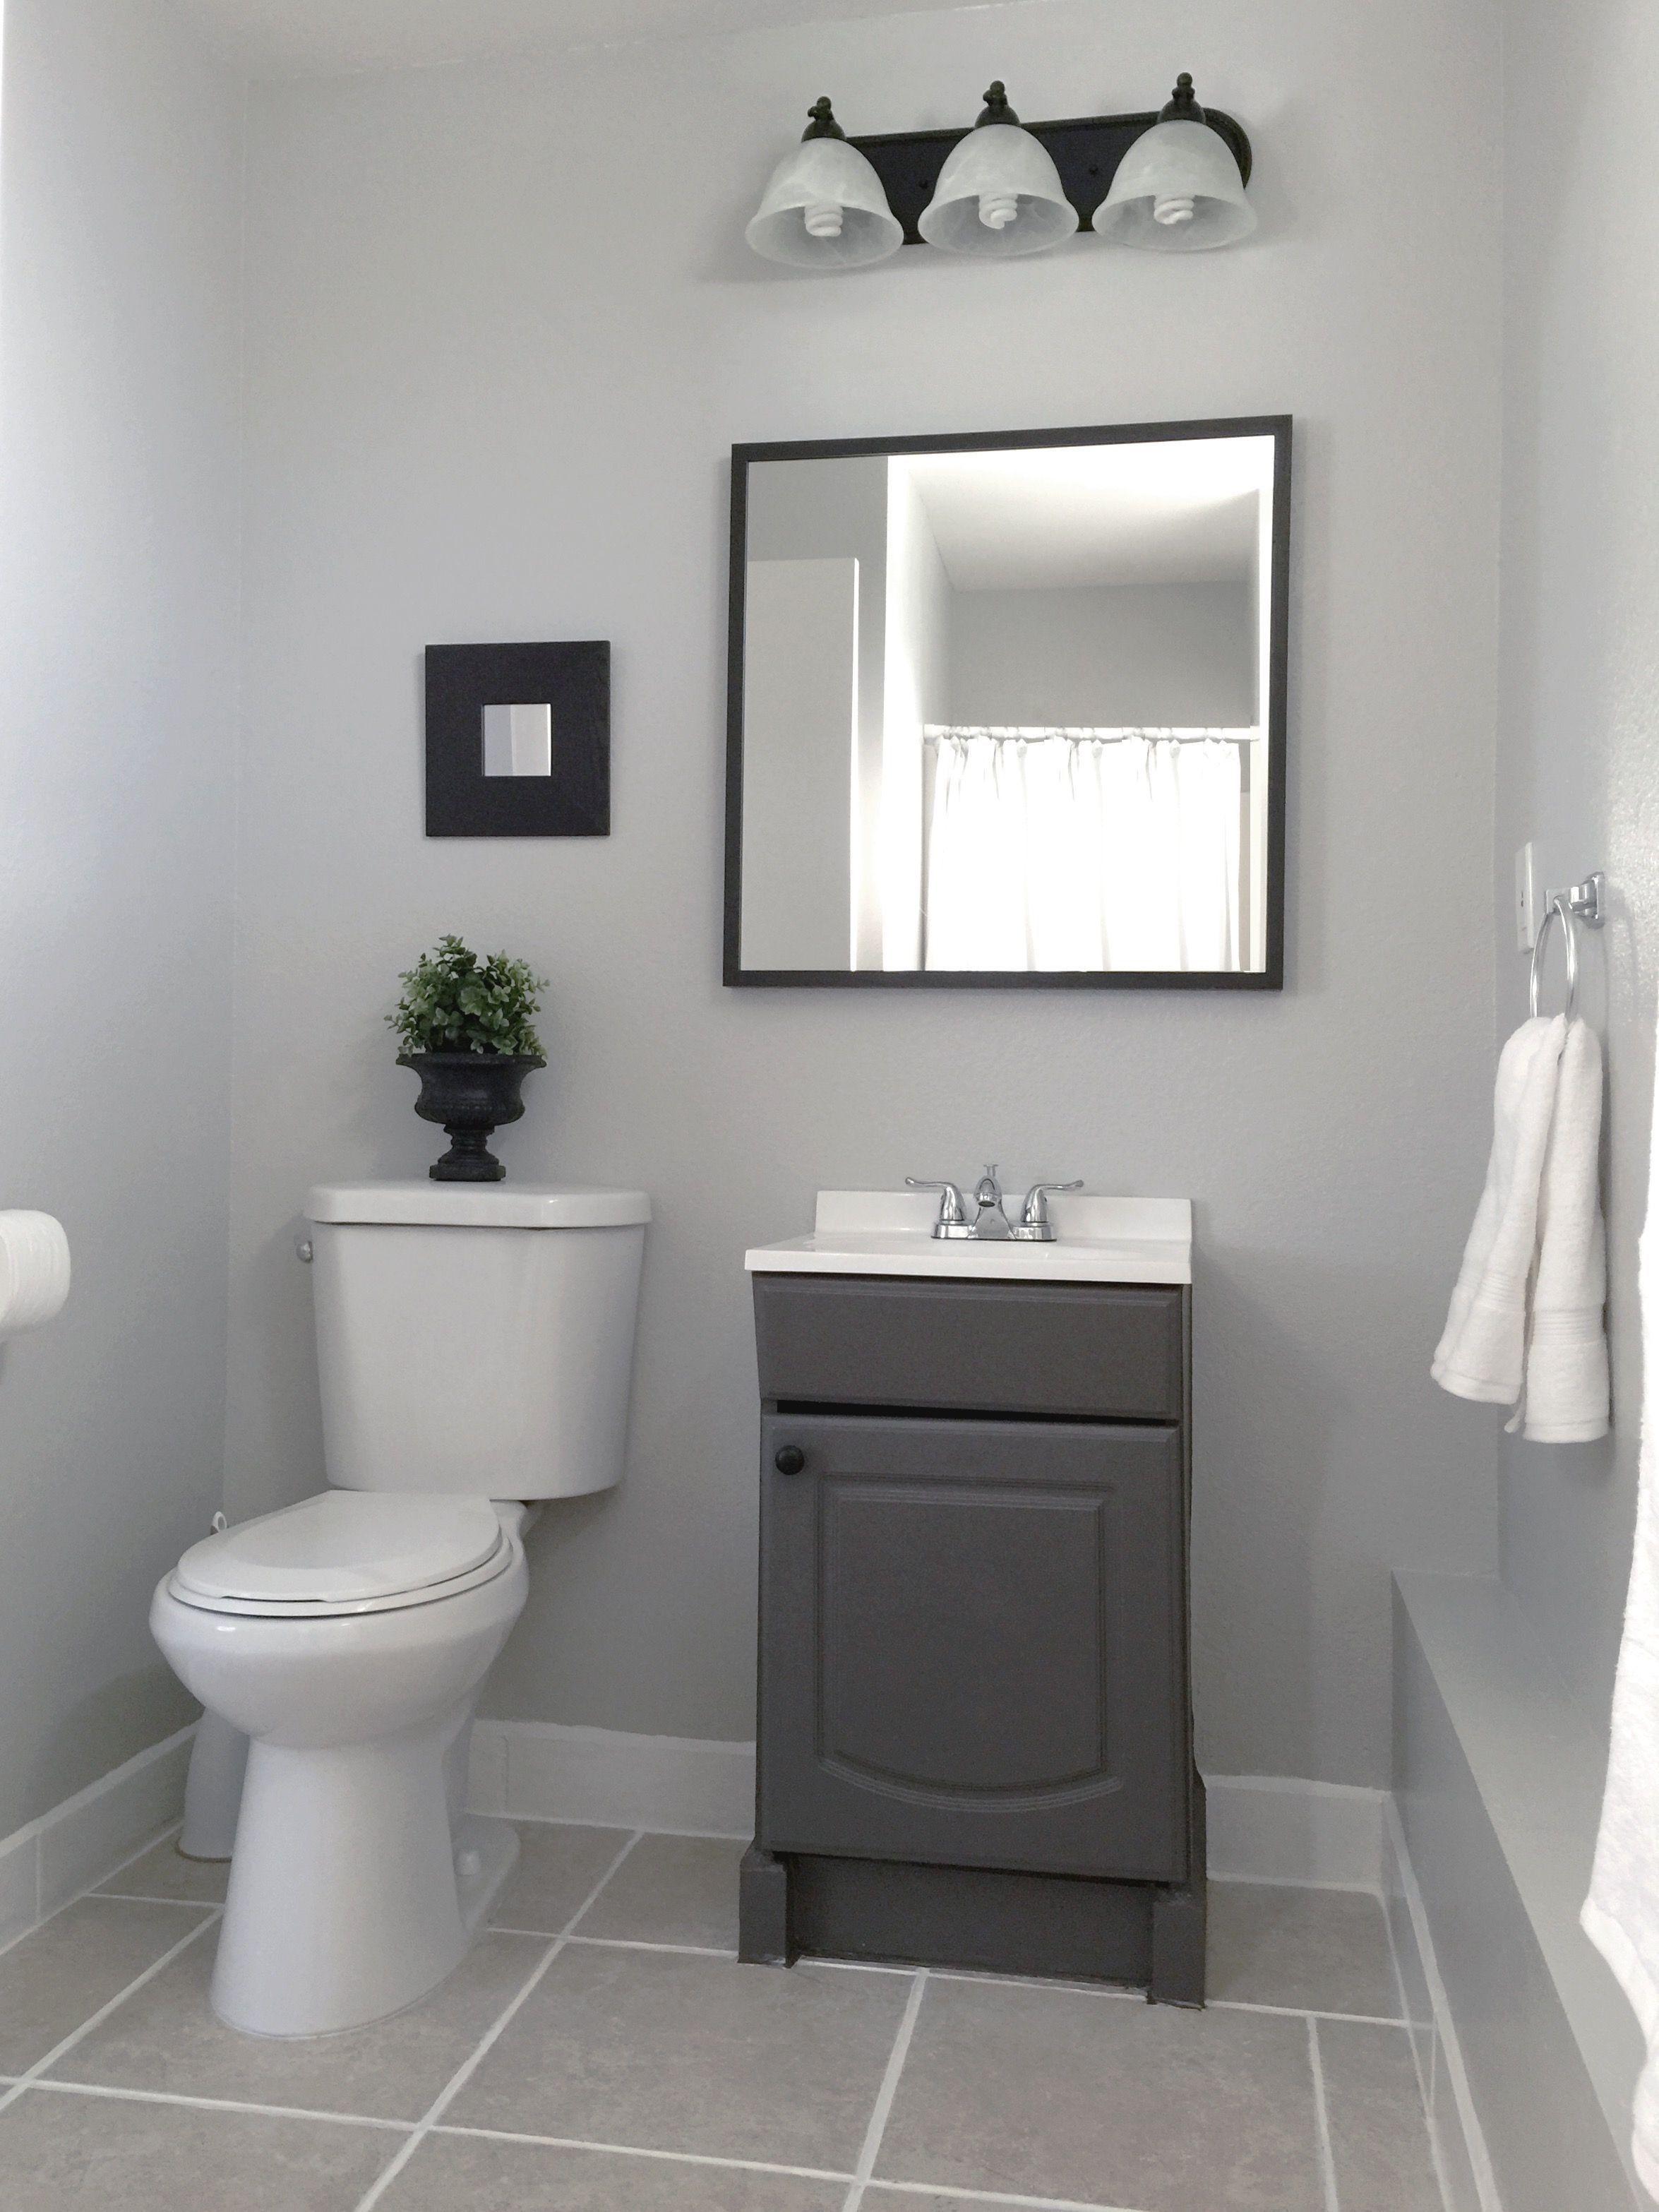 Bathroom Color Schemes For Small Bathrooms With Modern Mirror Small Bathroom Paint Small Bathroom Colors Bathroom Paint Colors Behr